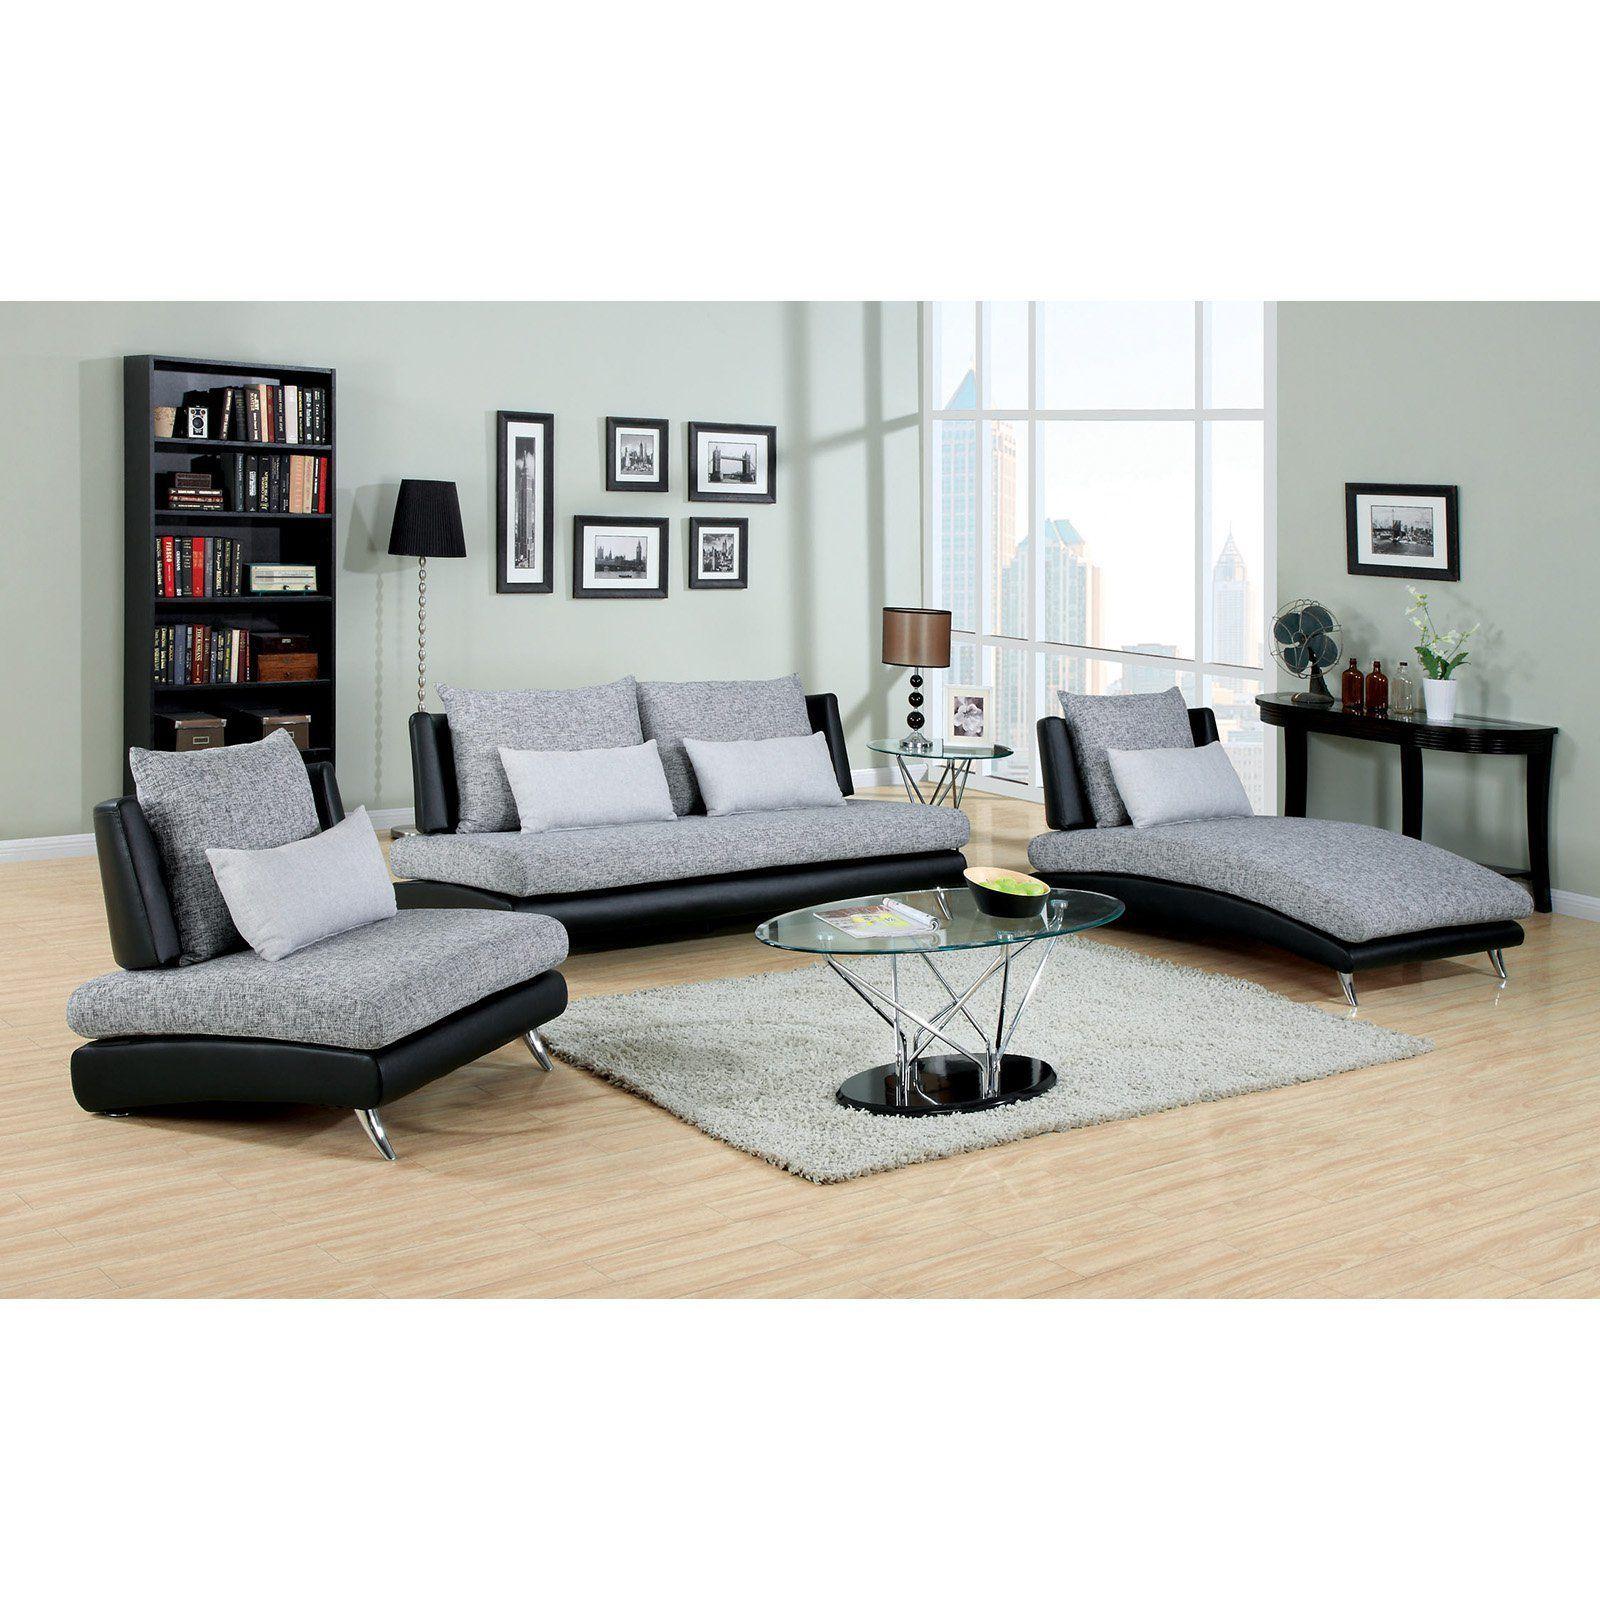 Furniture of America Cole 3-Piece Fabric and Faux Leather Sofa Set ...